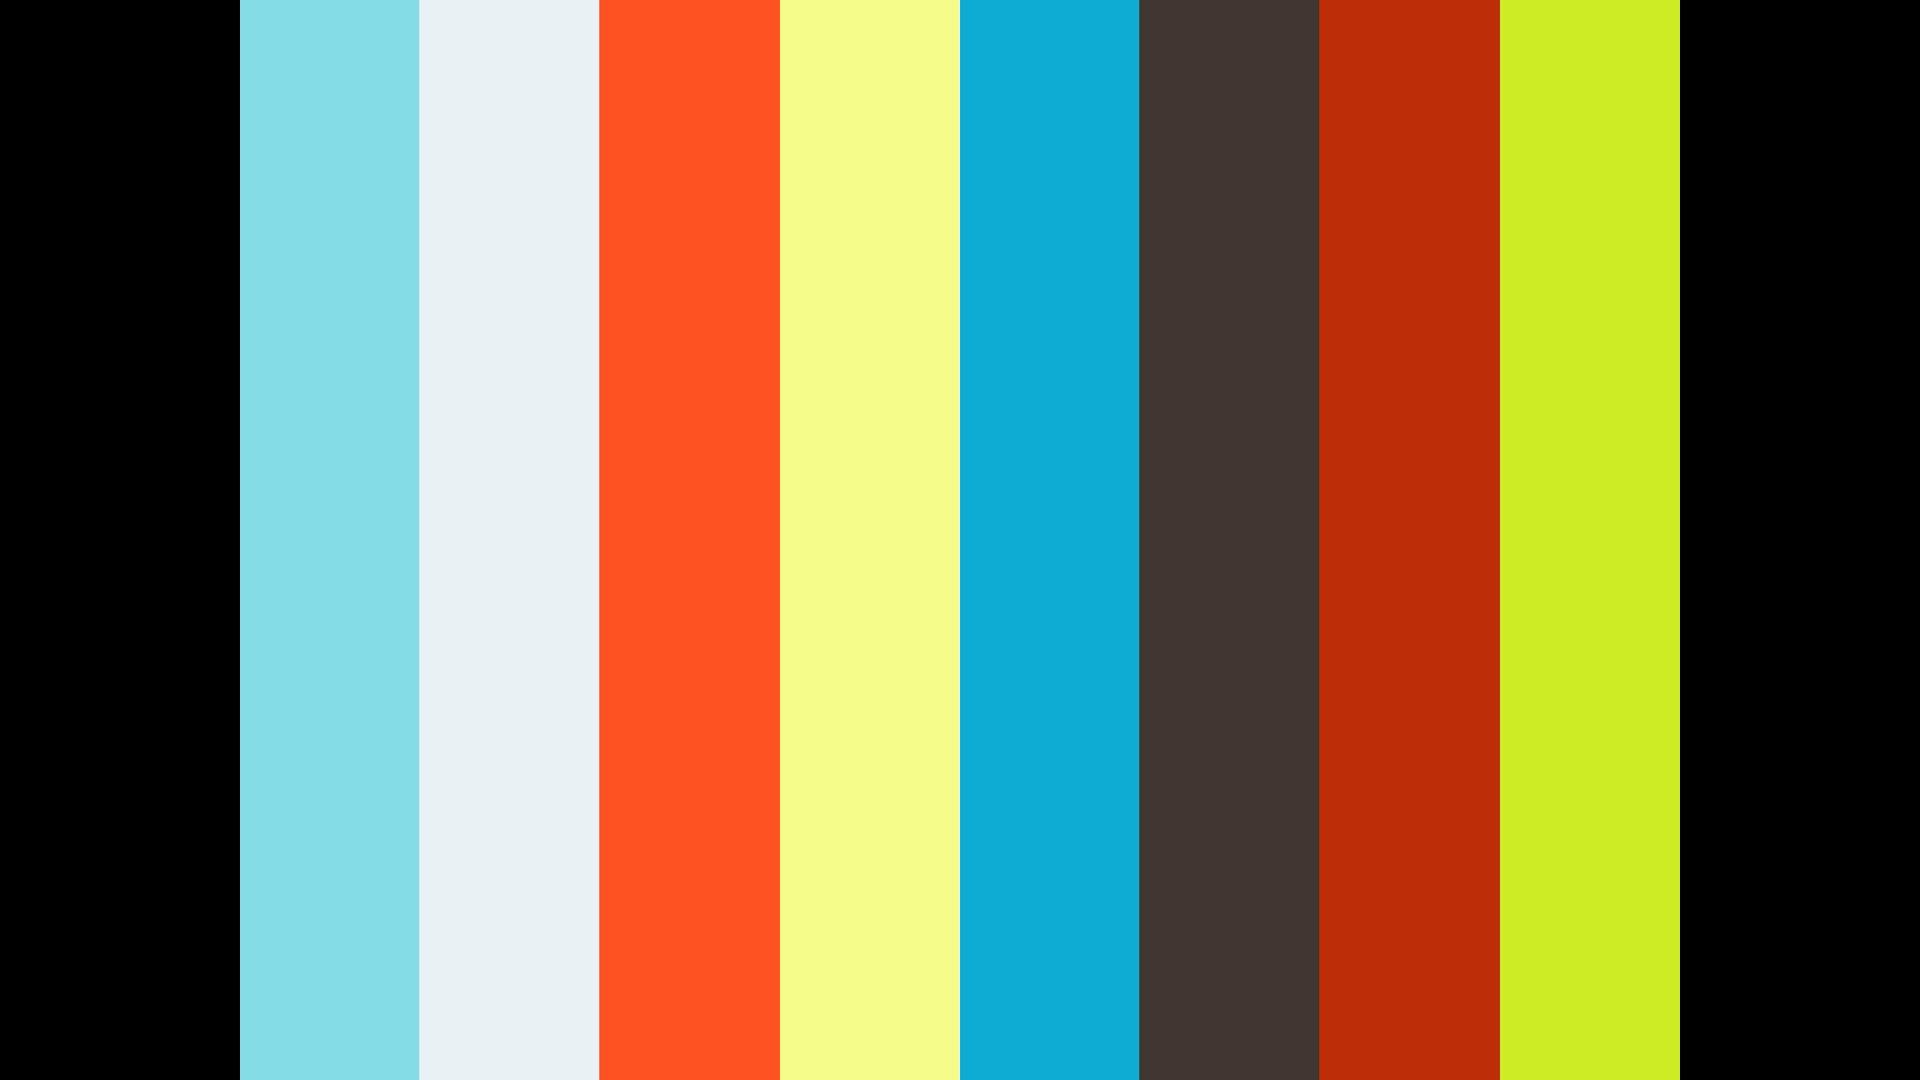 LIVE 24 MARS - ZUMBA - MELISSA